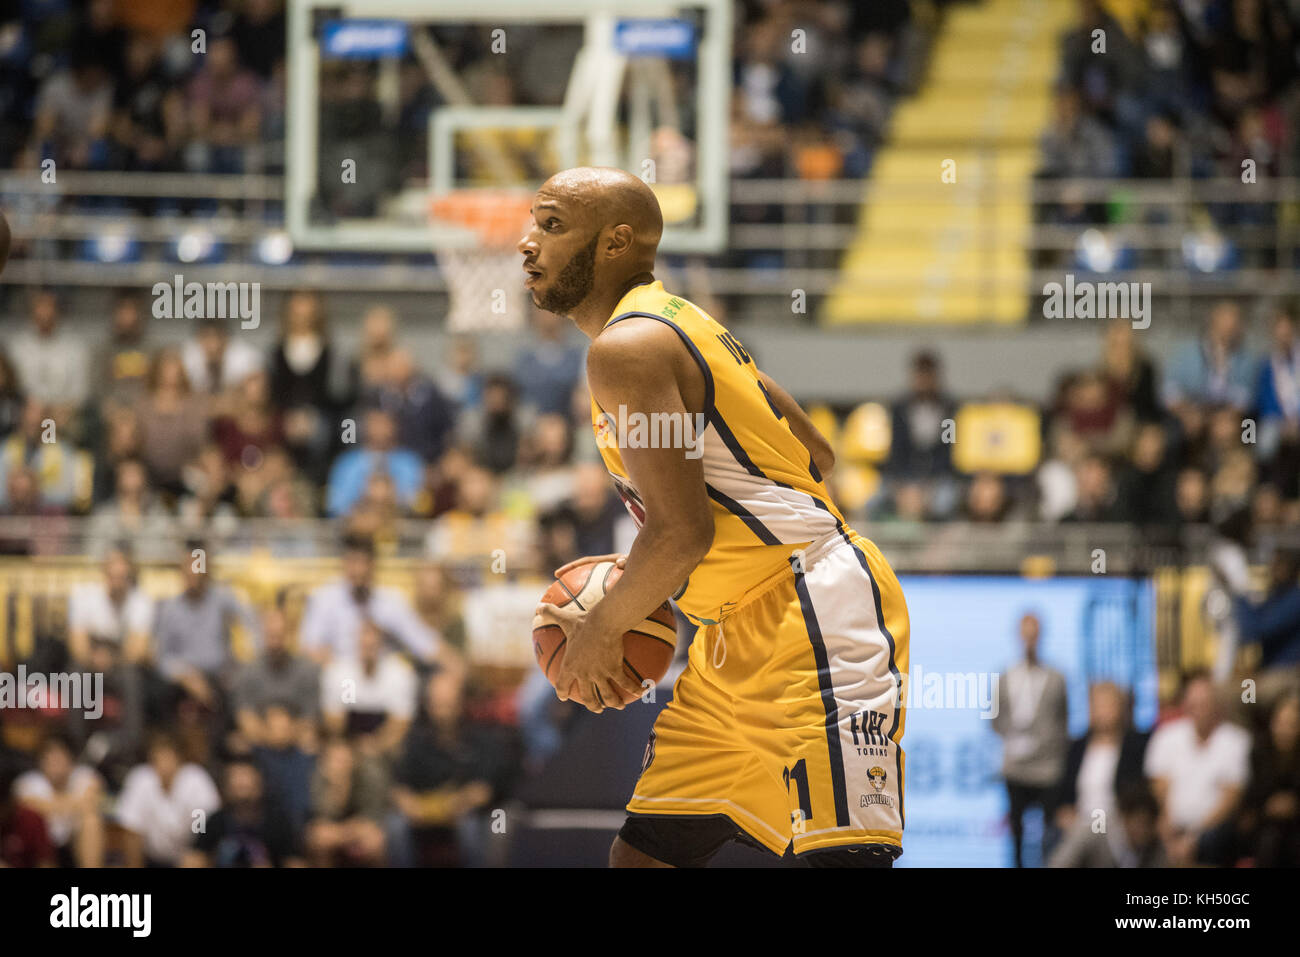 Andre Jones (Fiat Torino Auxilium) during the Basketball match, Serie A: Fiat Torino Auxilium vs Vanoli Cremona. Stock Photo